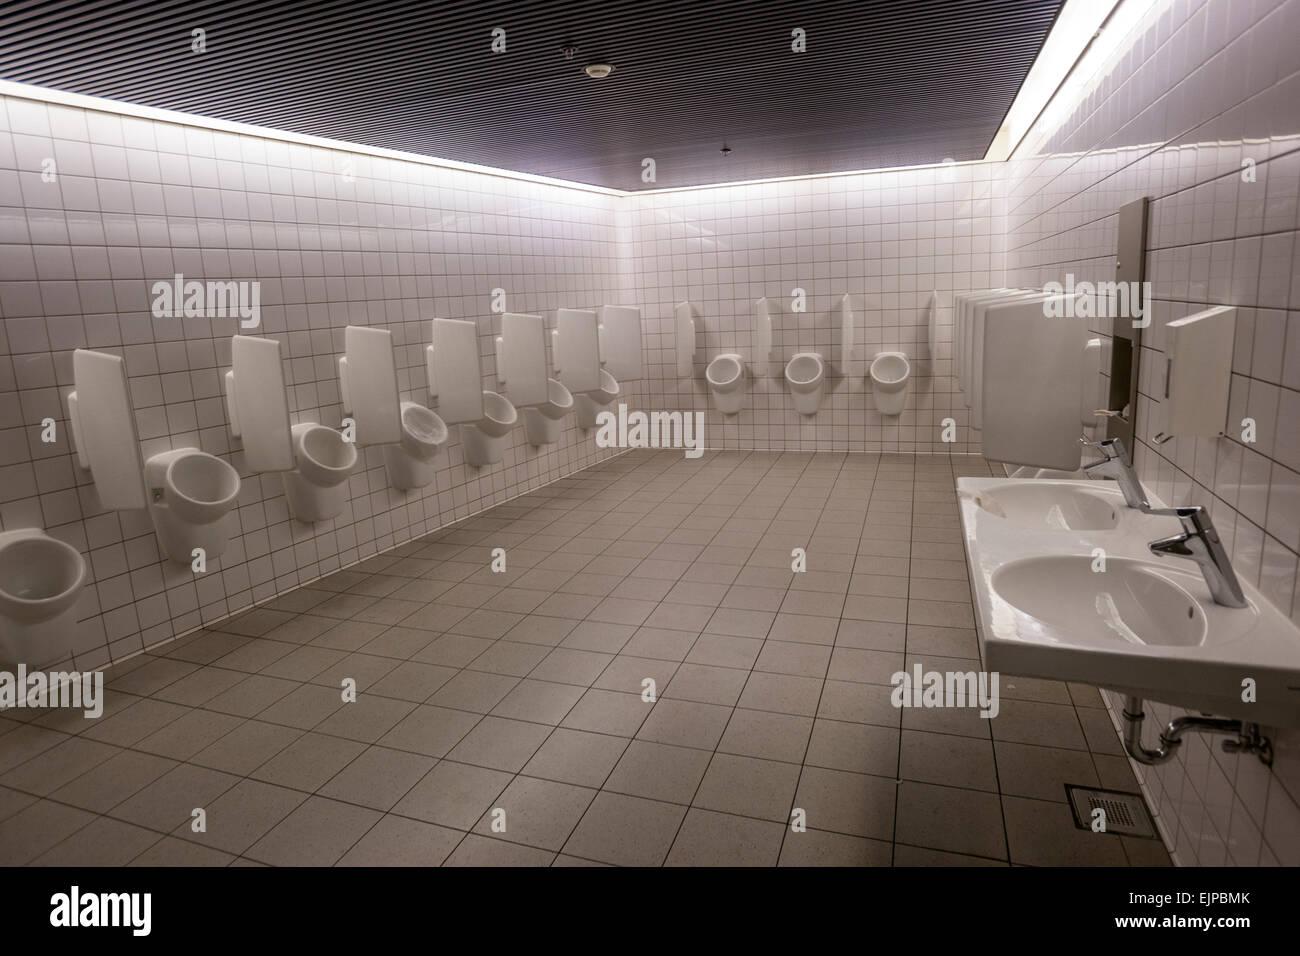 Schiphol plaza mens toilets